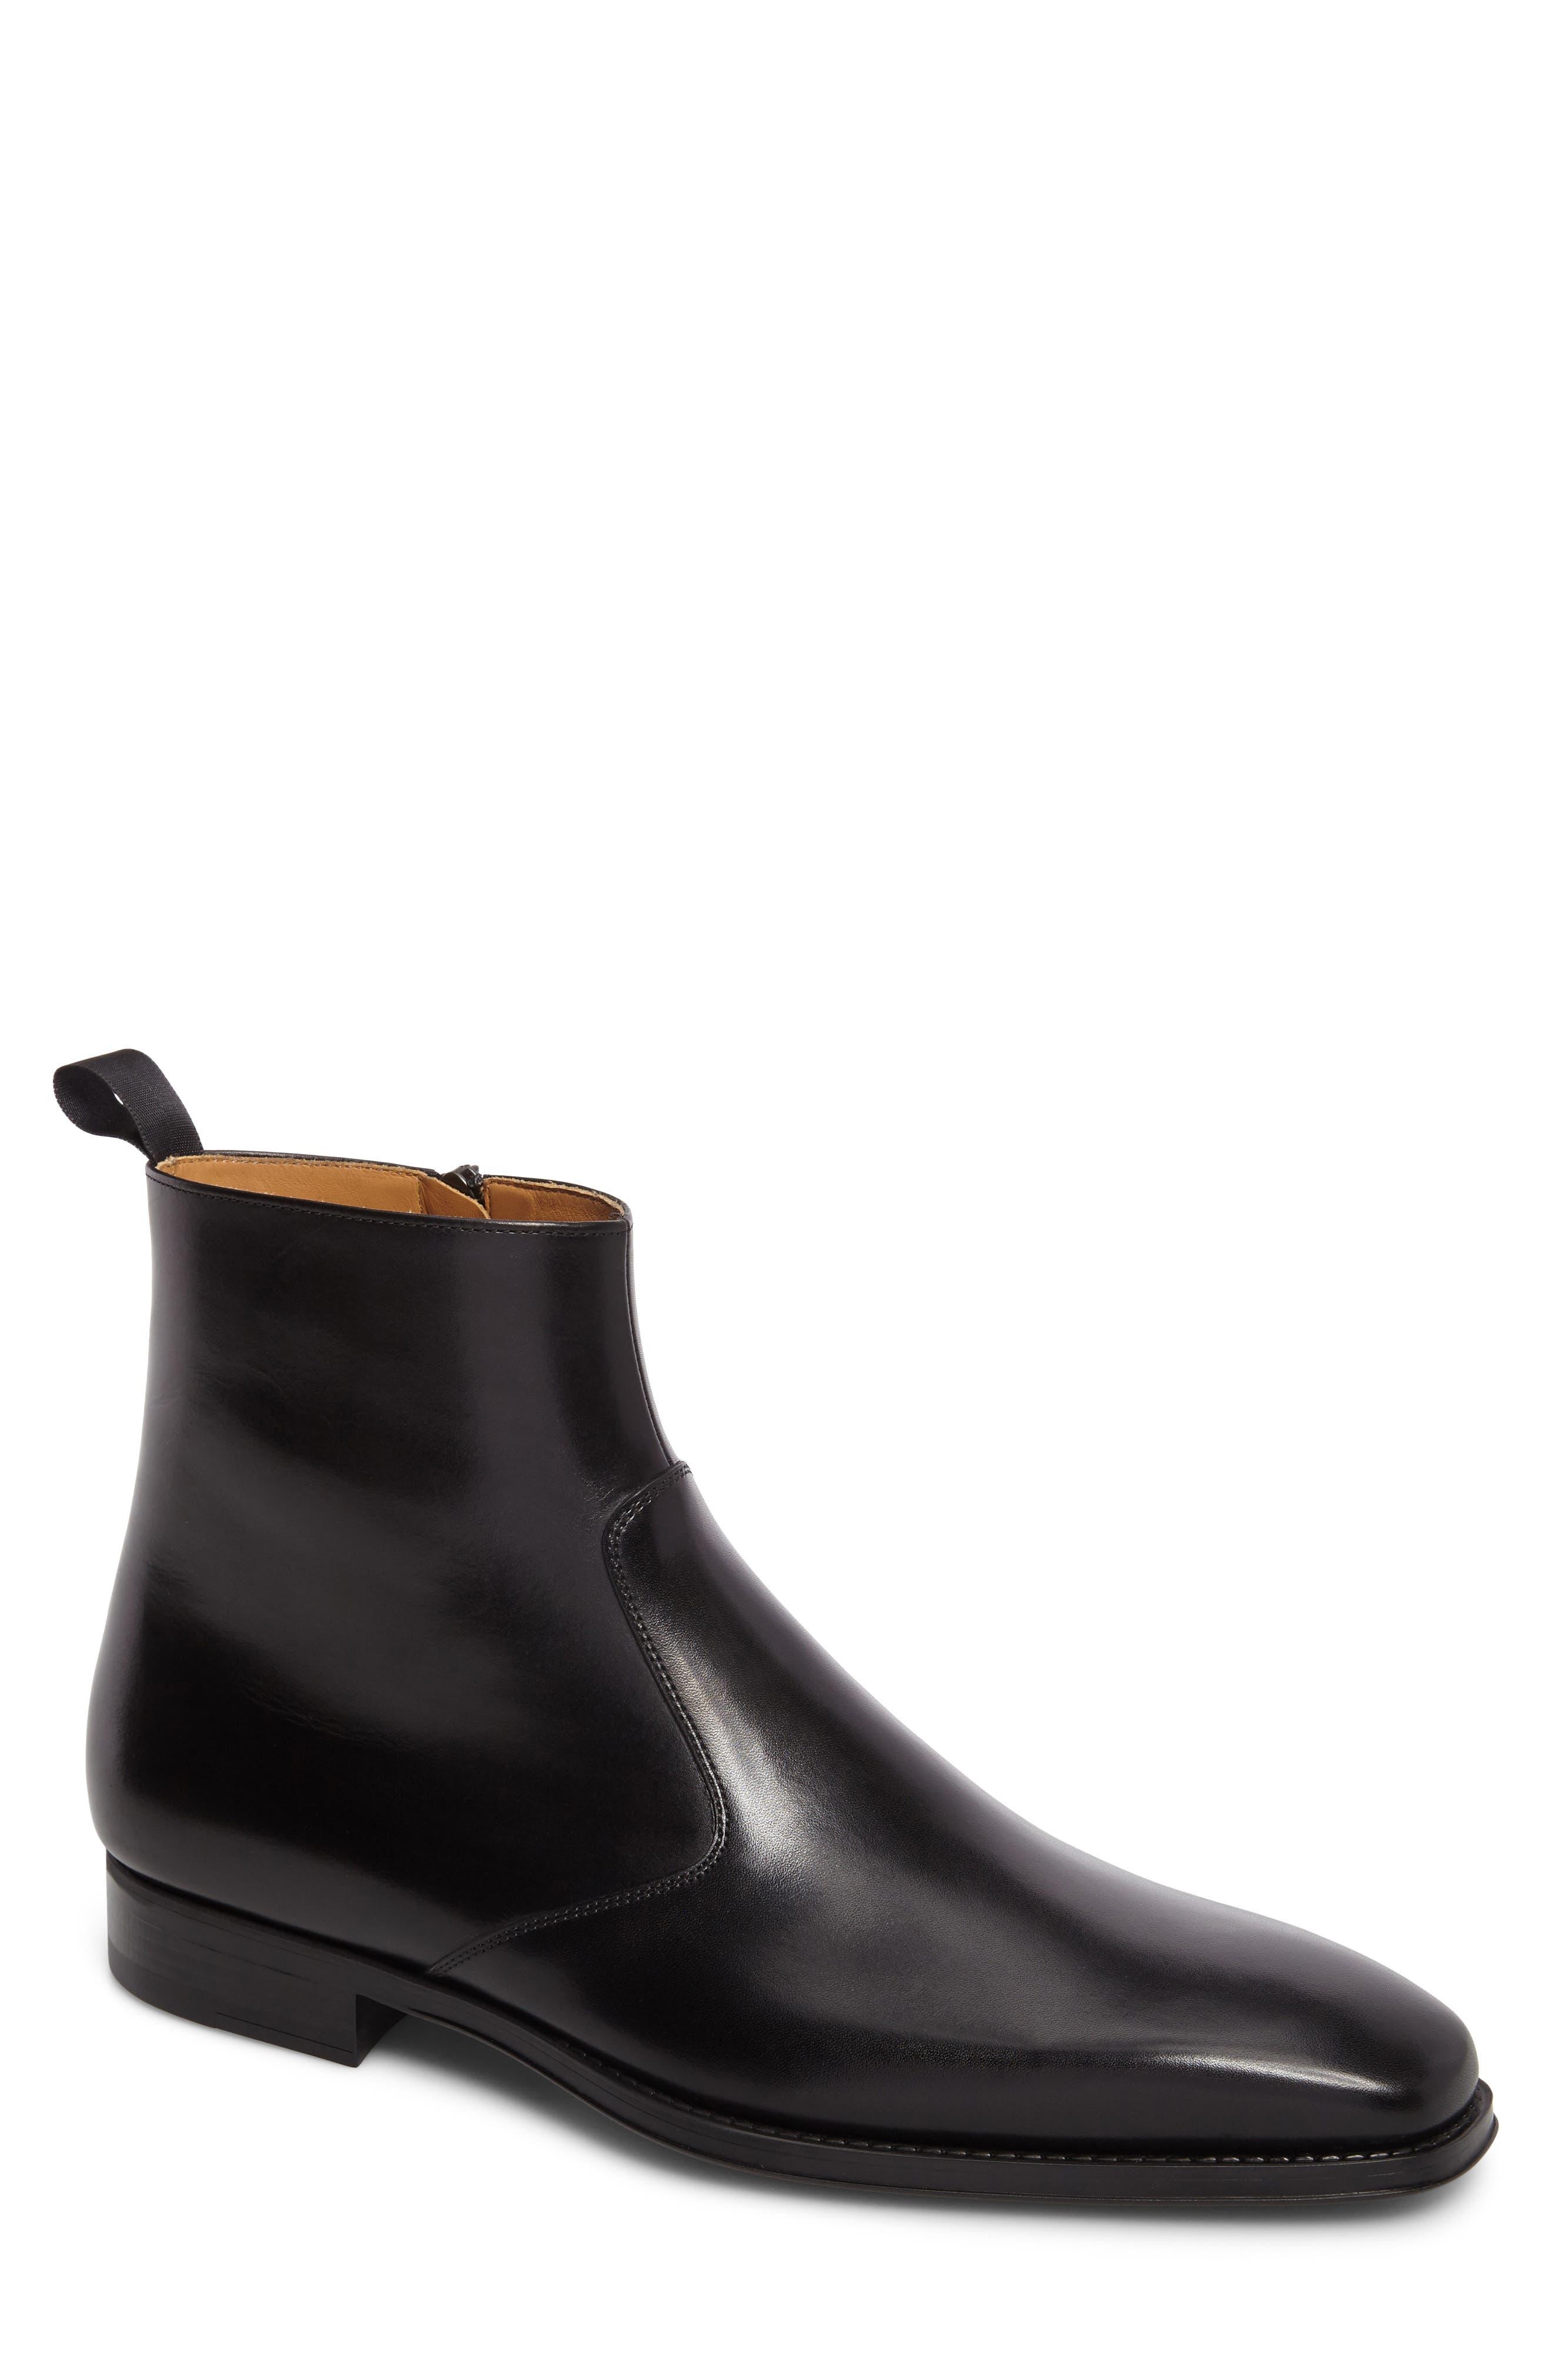 Rosdale Zip Boot,                             Main thumbnail 1, color,                             BLACK LEATHER